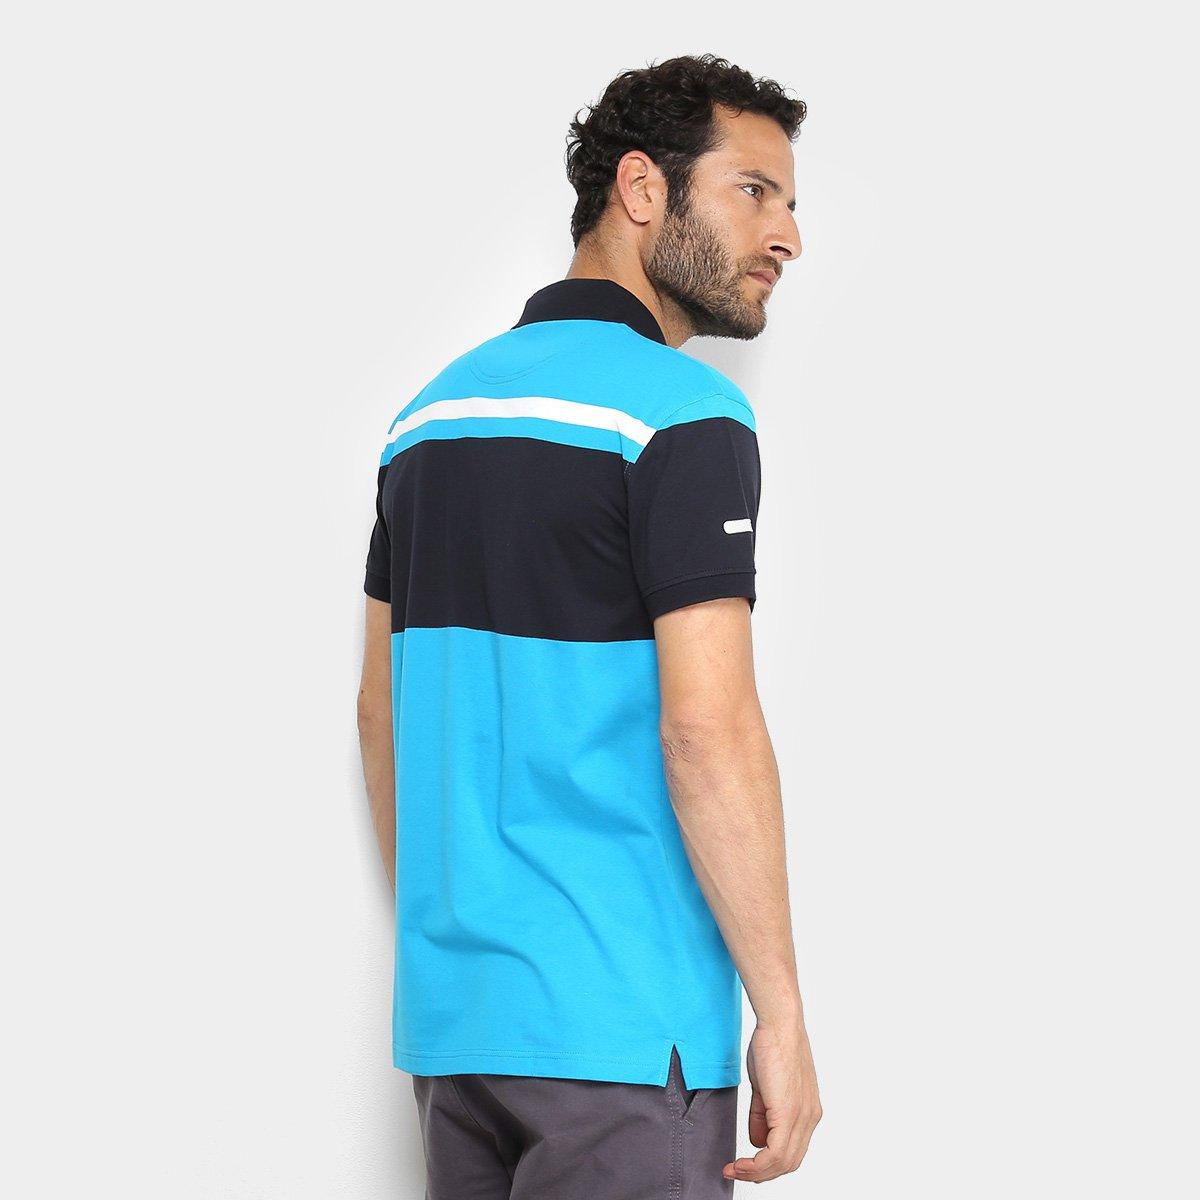 Camisa Polo Aleatory Listras Masculina  Camisa Polo Aleatory Listras  Masculina ... 405e73693bf3b